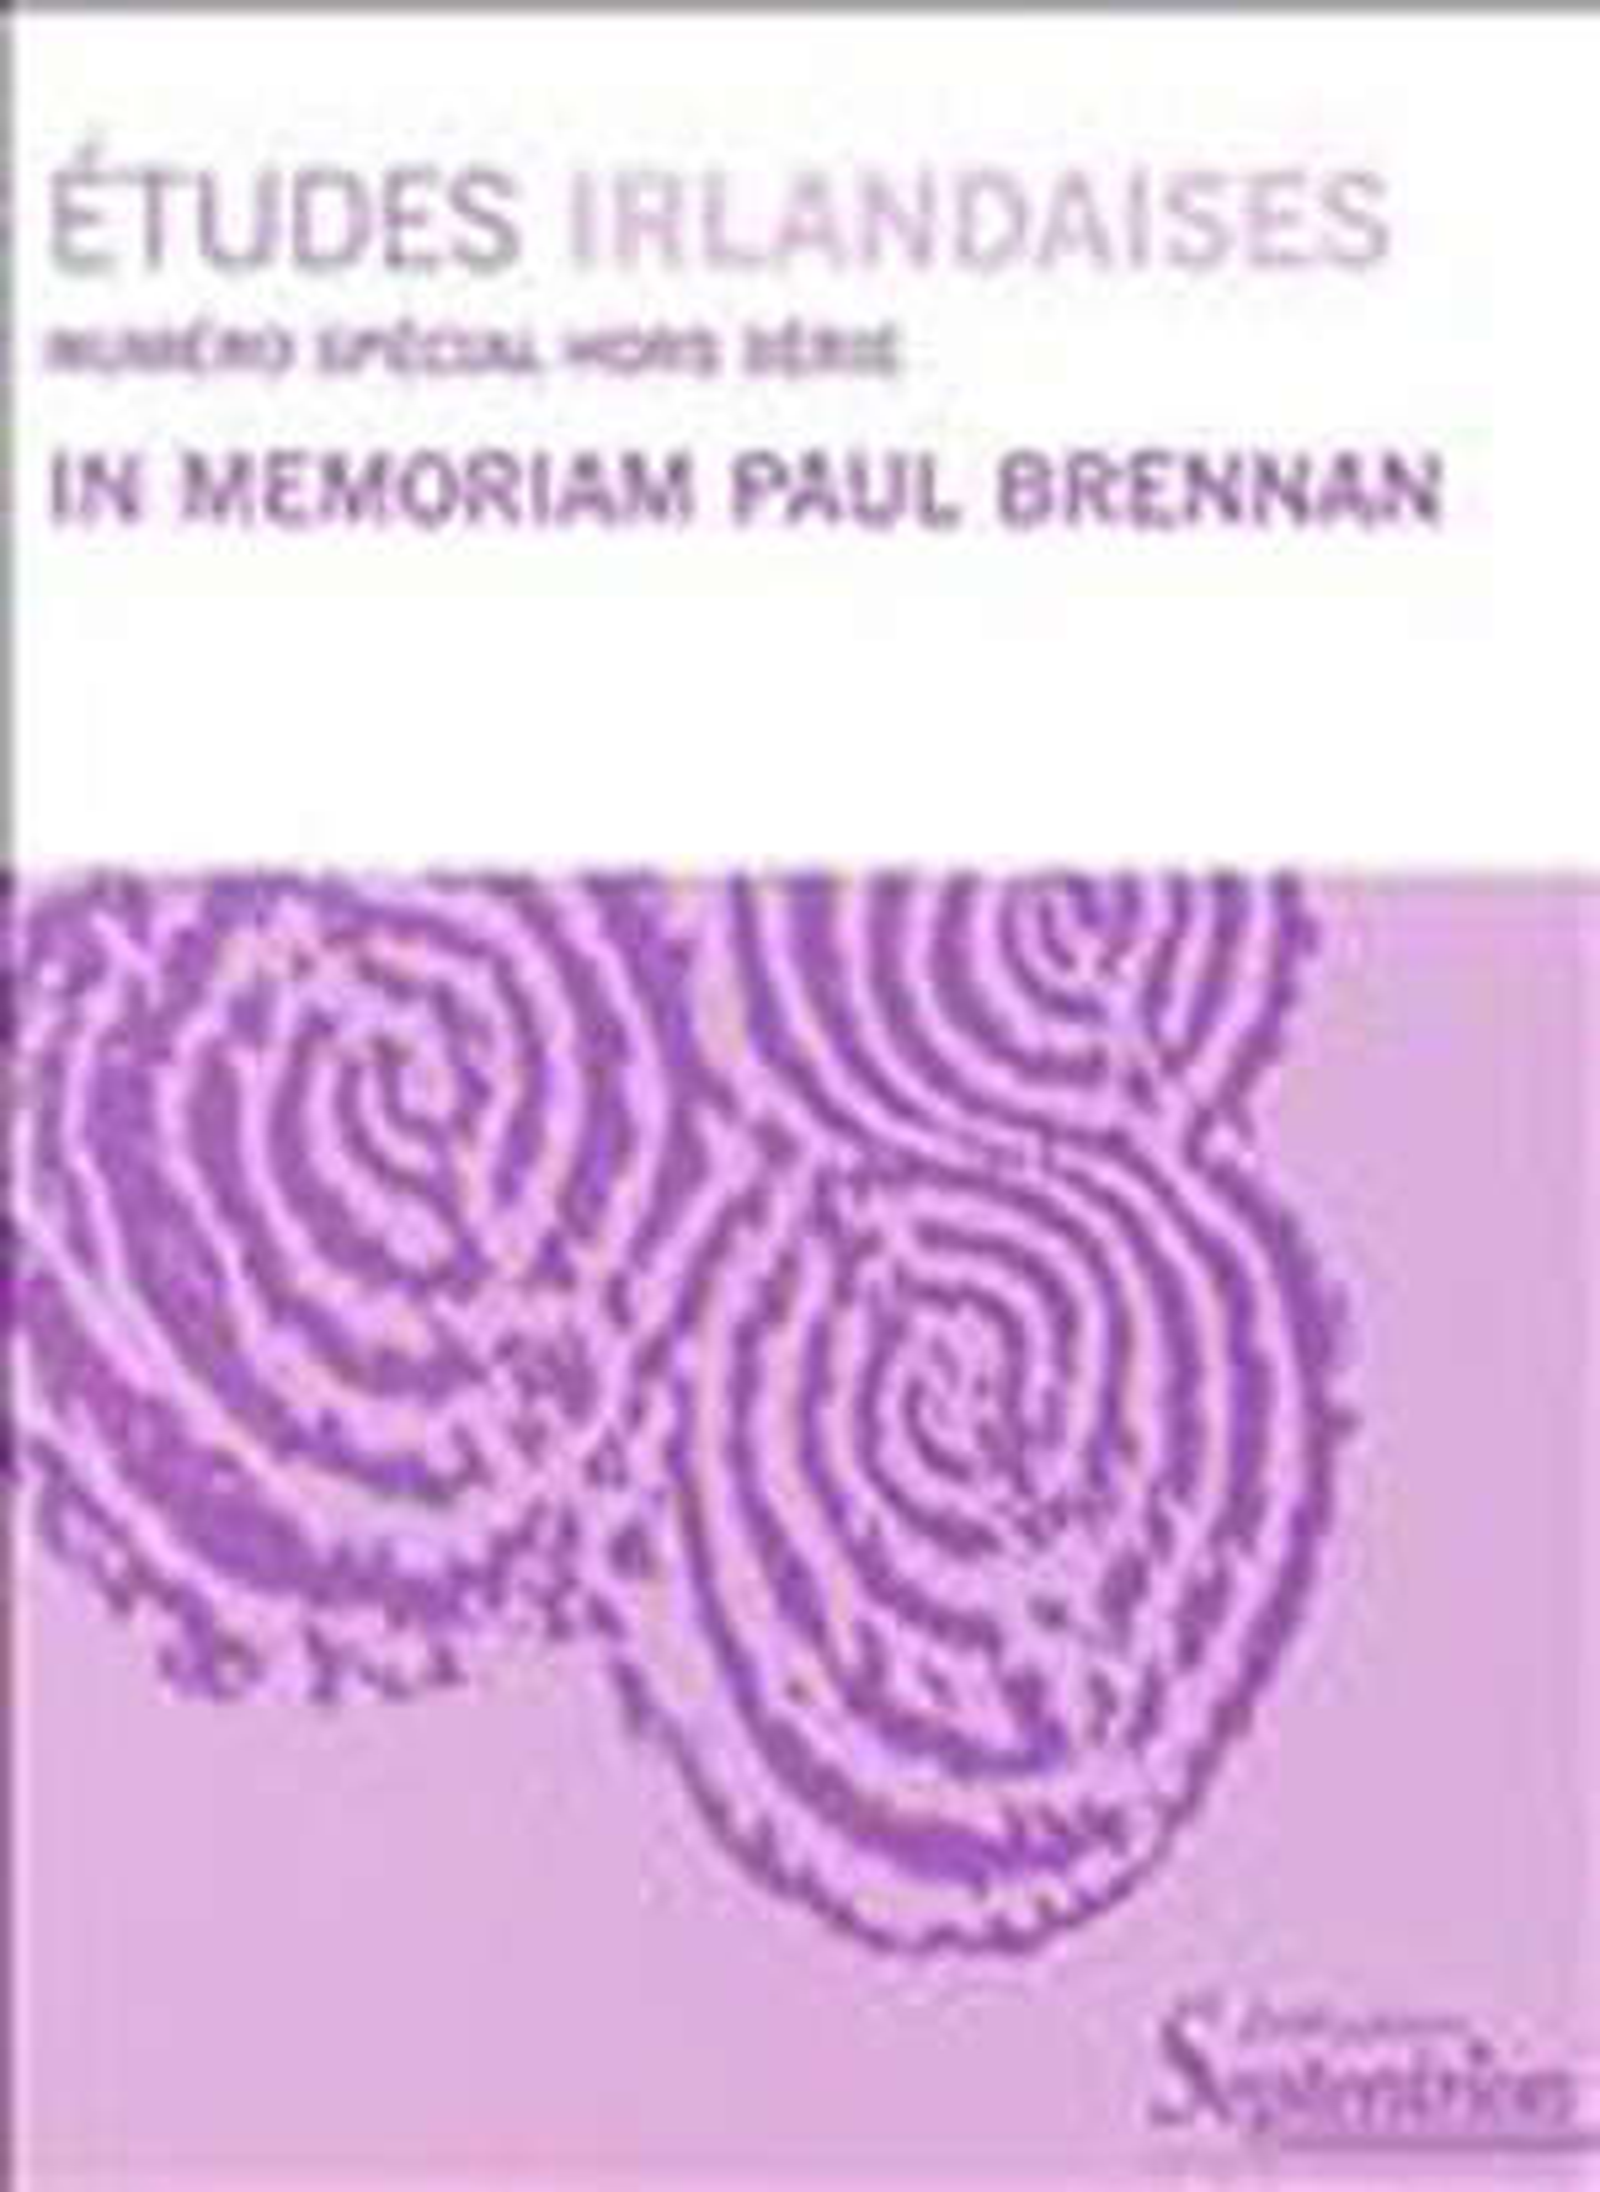 IN MEMORIAM PAUL BRENNAN